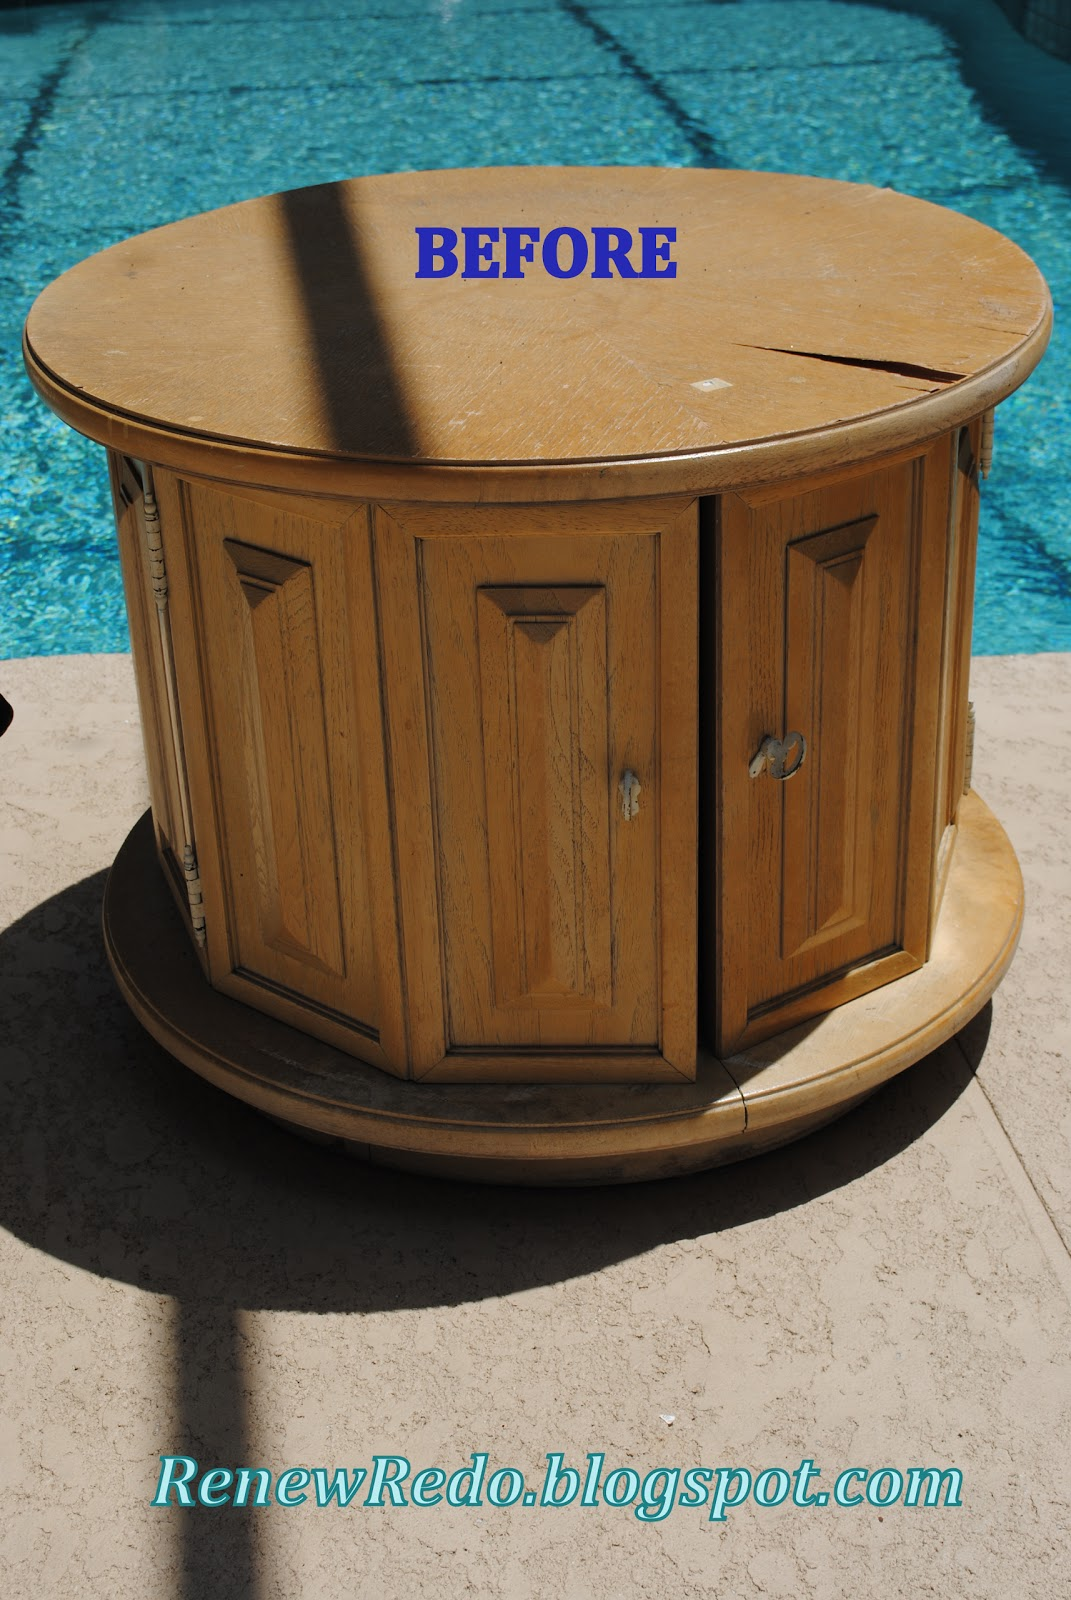 Renew Redo Vintage End Table Turned Storage Ottoman